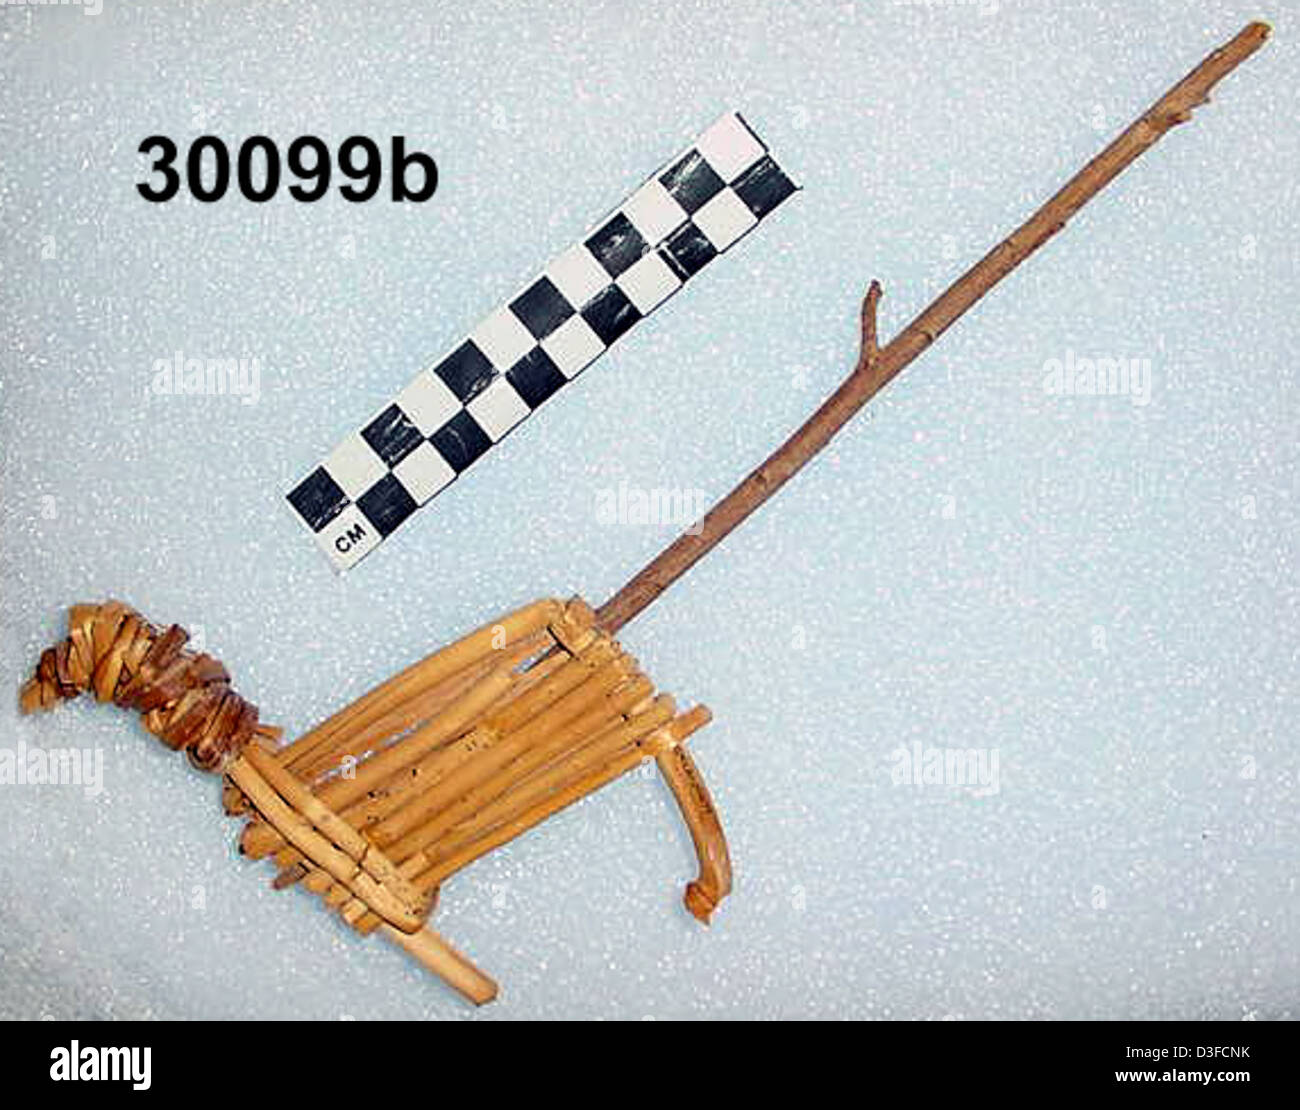 Split-Twig Figurine GRCA_30099b - Stock Image